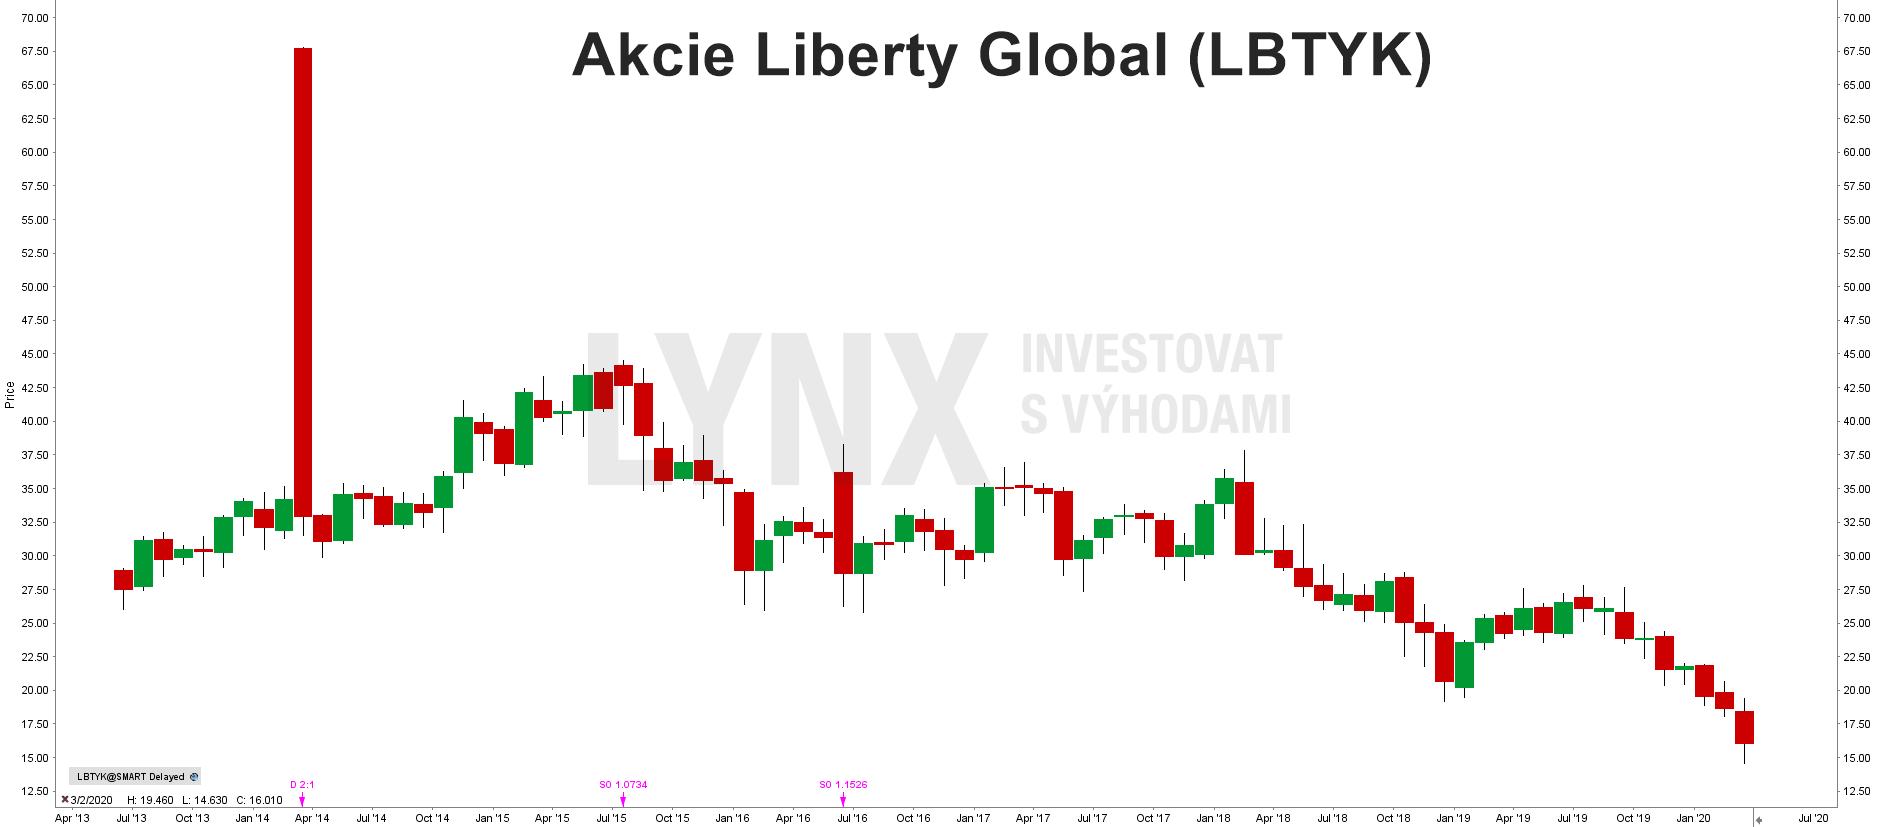 Akcie Liberty Global (LBTYK)